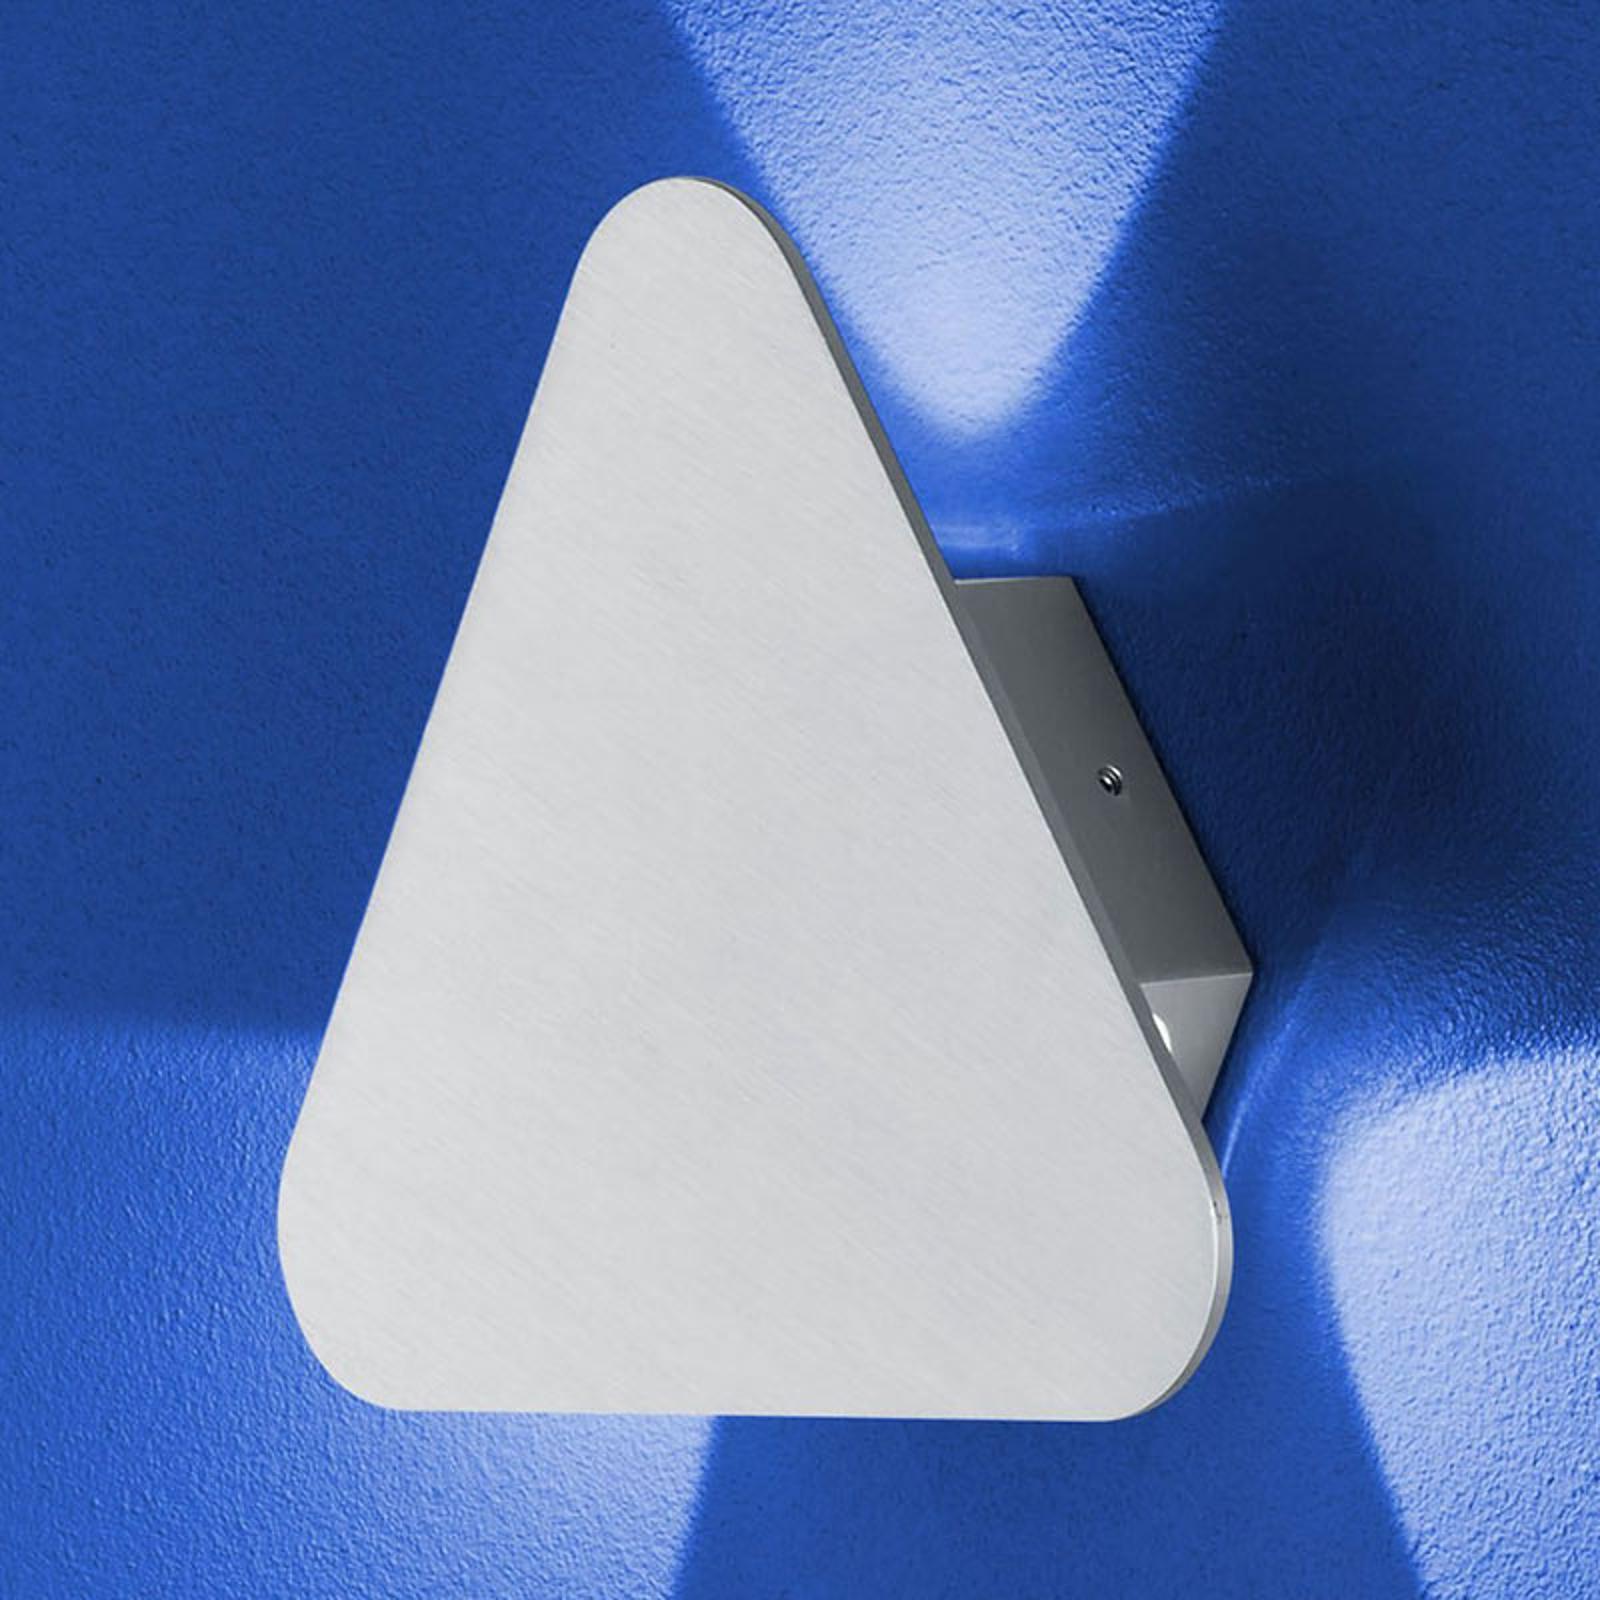 B-Leuchten Prince wandlamp IP54, driehoekig